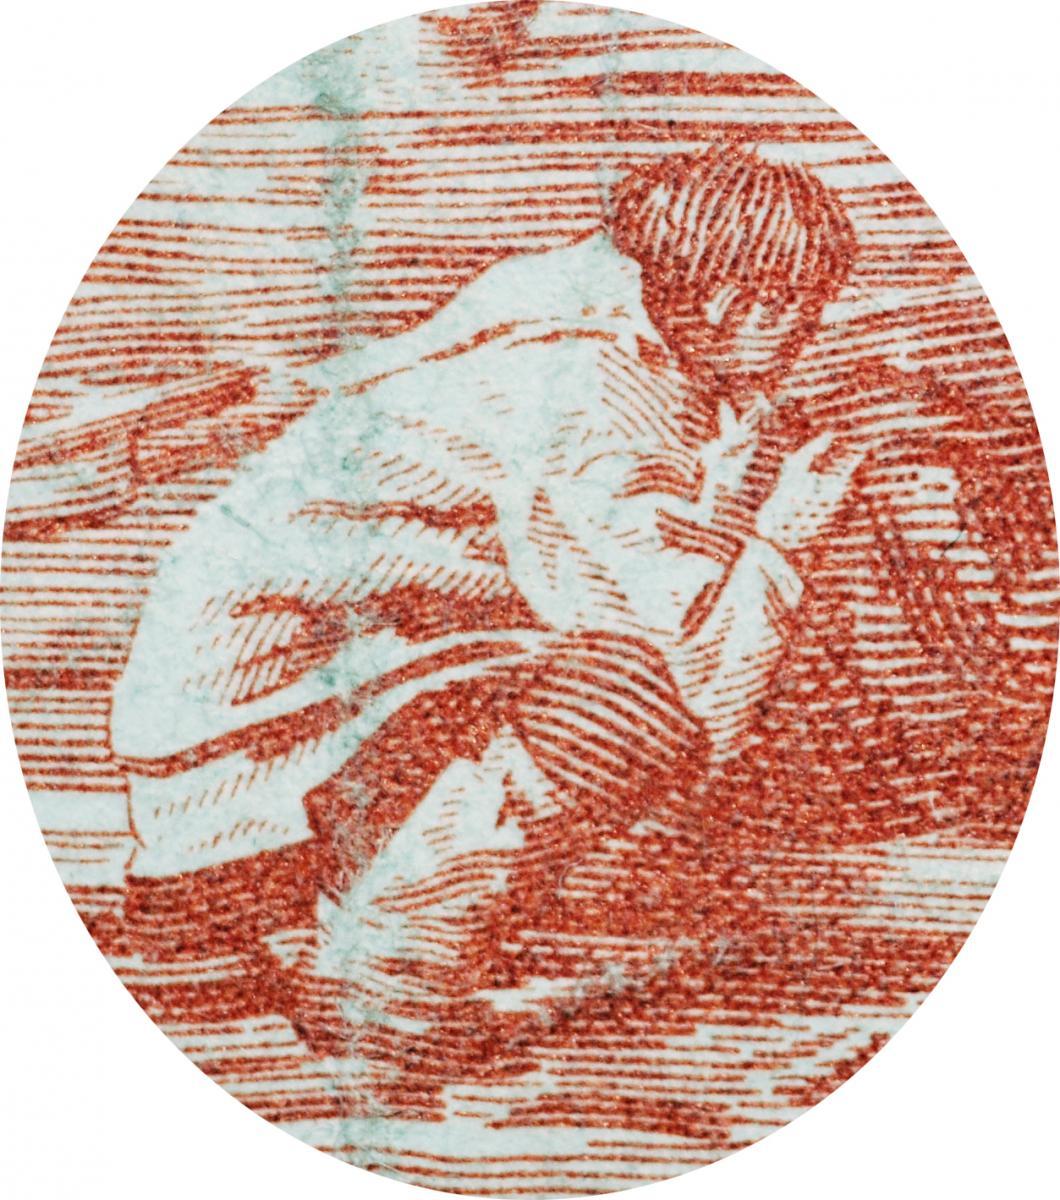 Engraving of man squatting by a kayak.